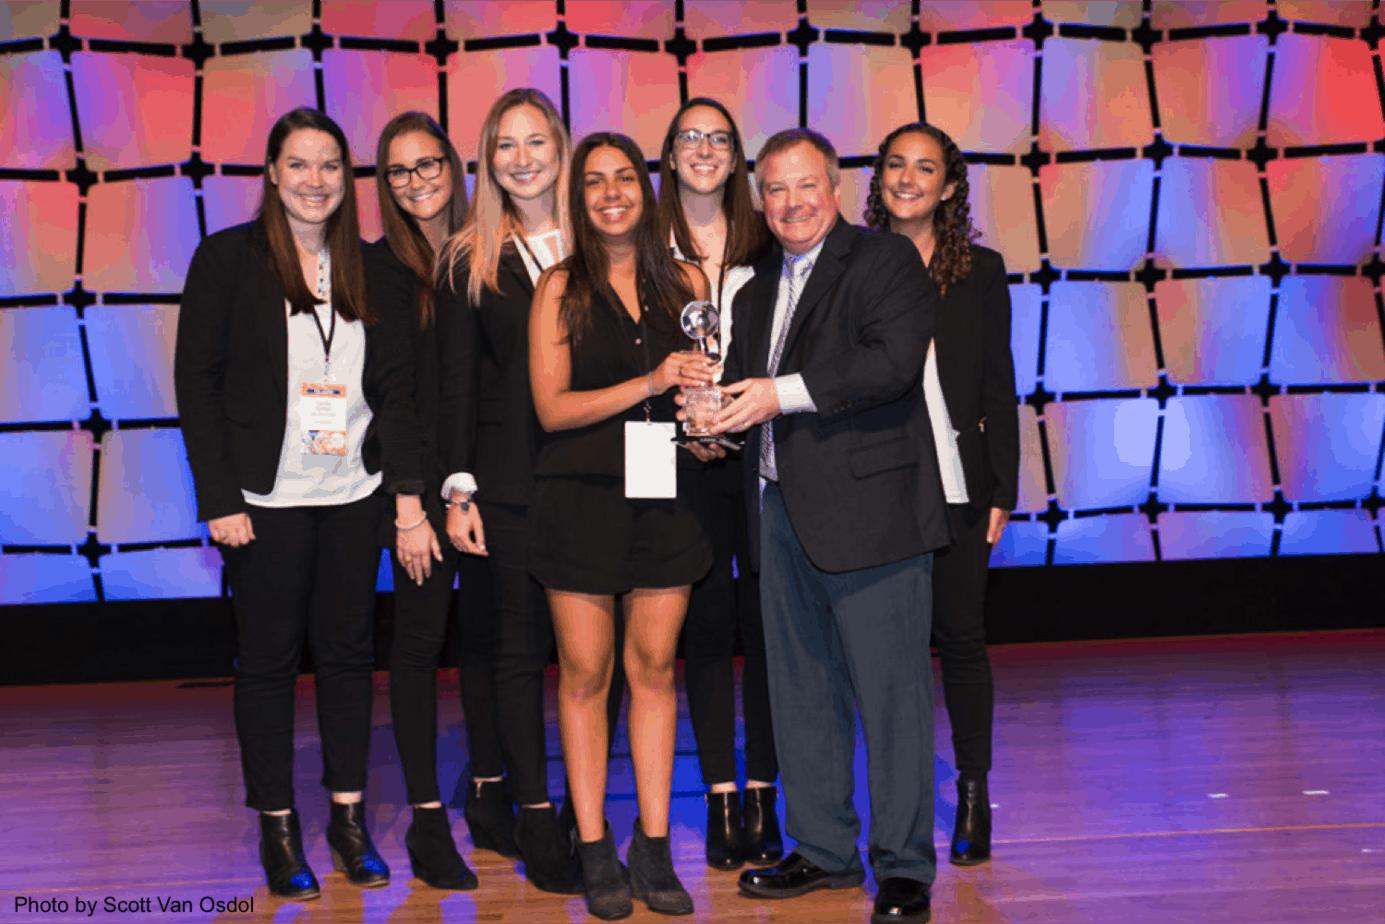 AdMall VP gives NSAC award to University of Virginia